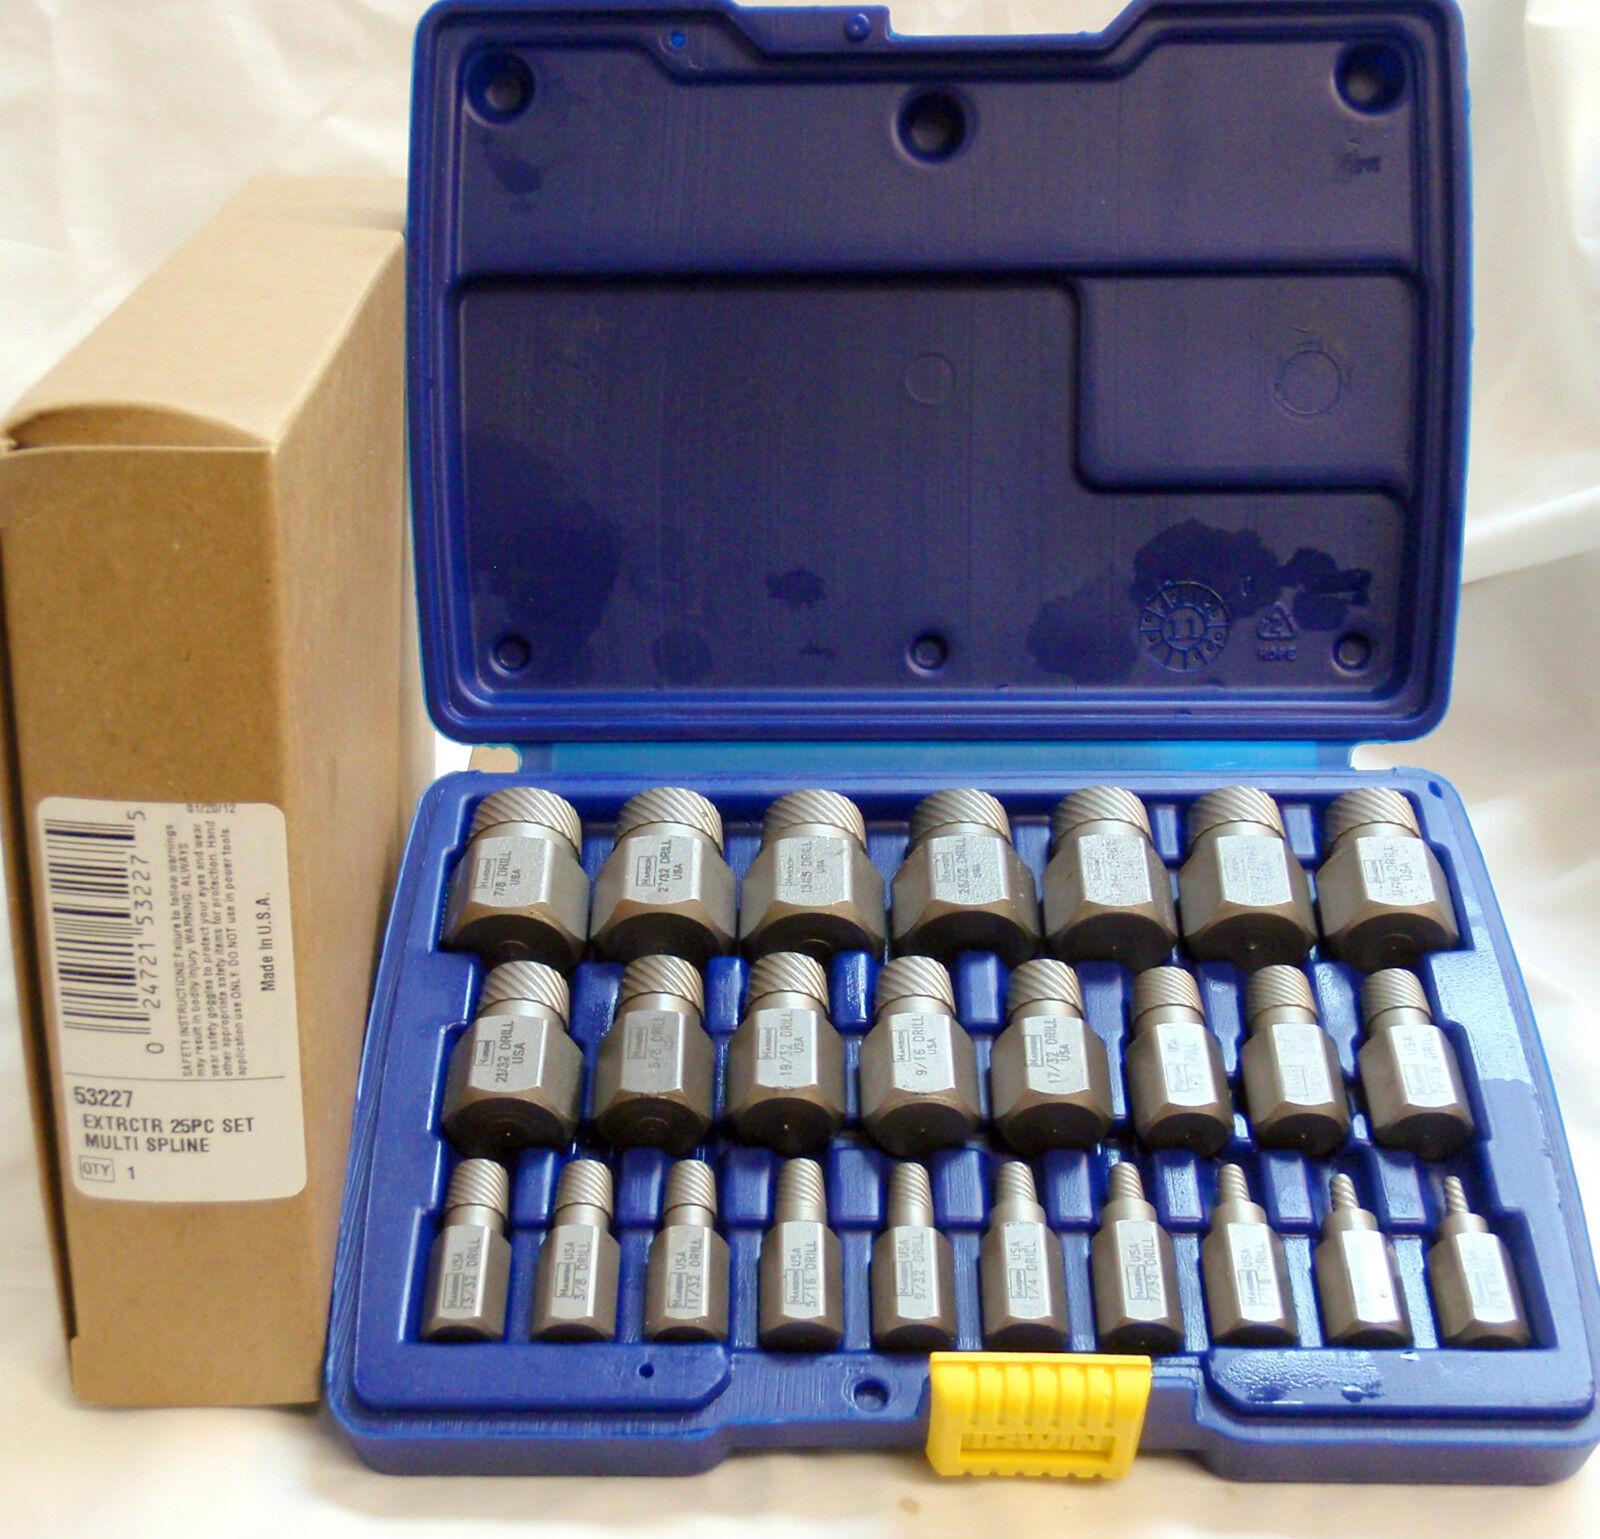 Irwin Hanson 53227 25pc. Multi-Spline Screw Extractor Set